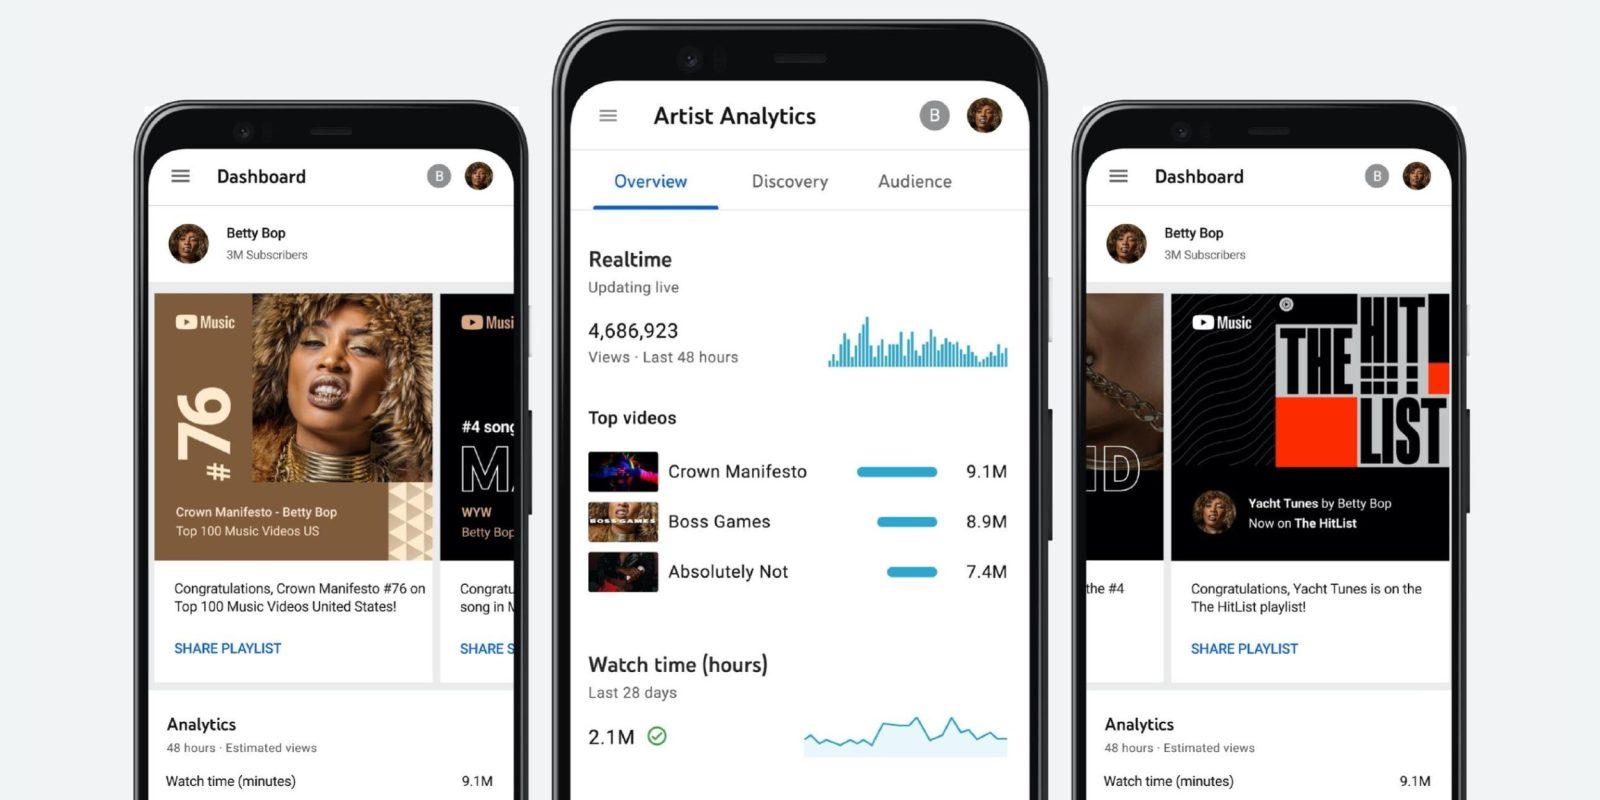 YouTube Studio picks up new Analytics for Artists data - 9to5Google